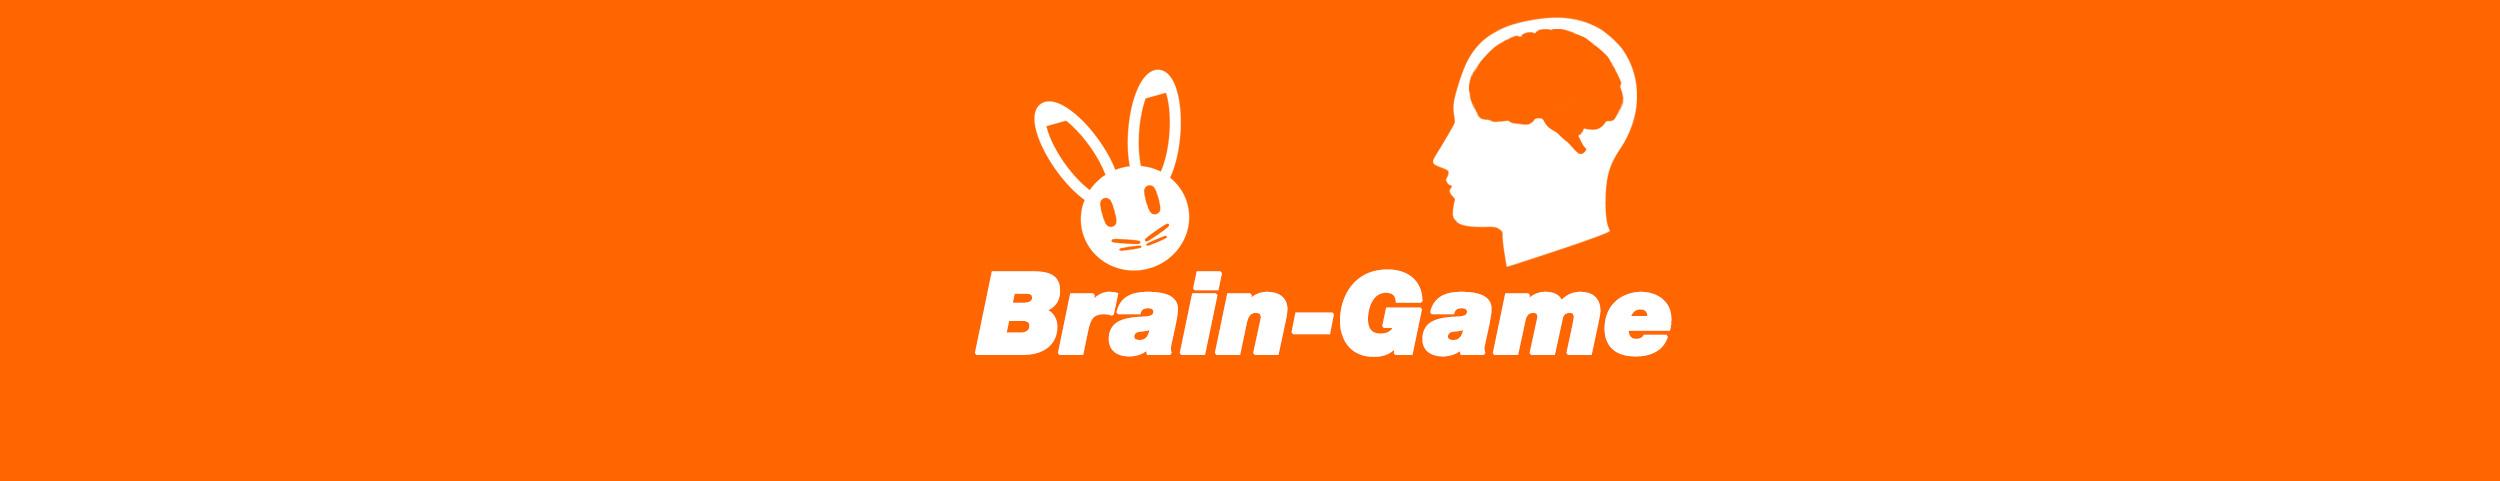 braingame_xl_ostern